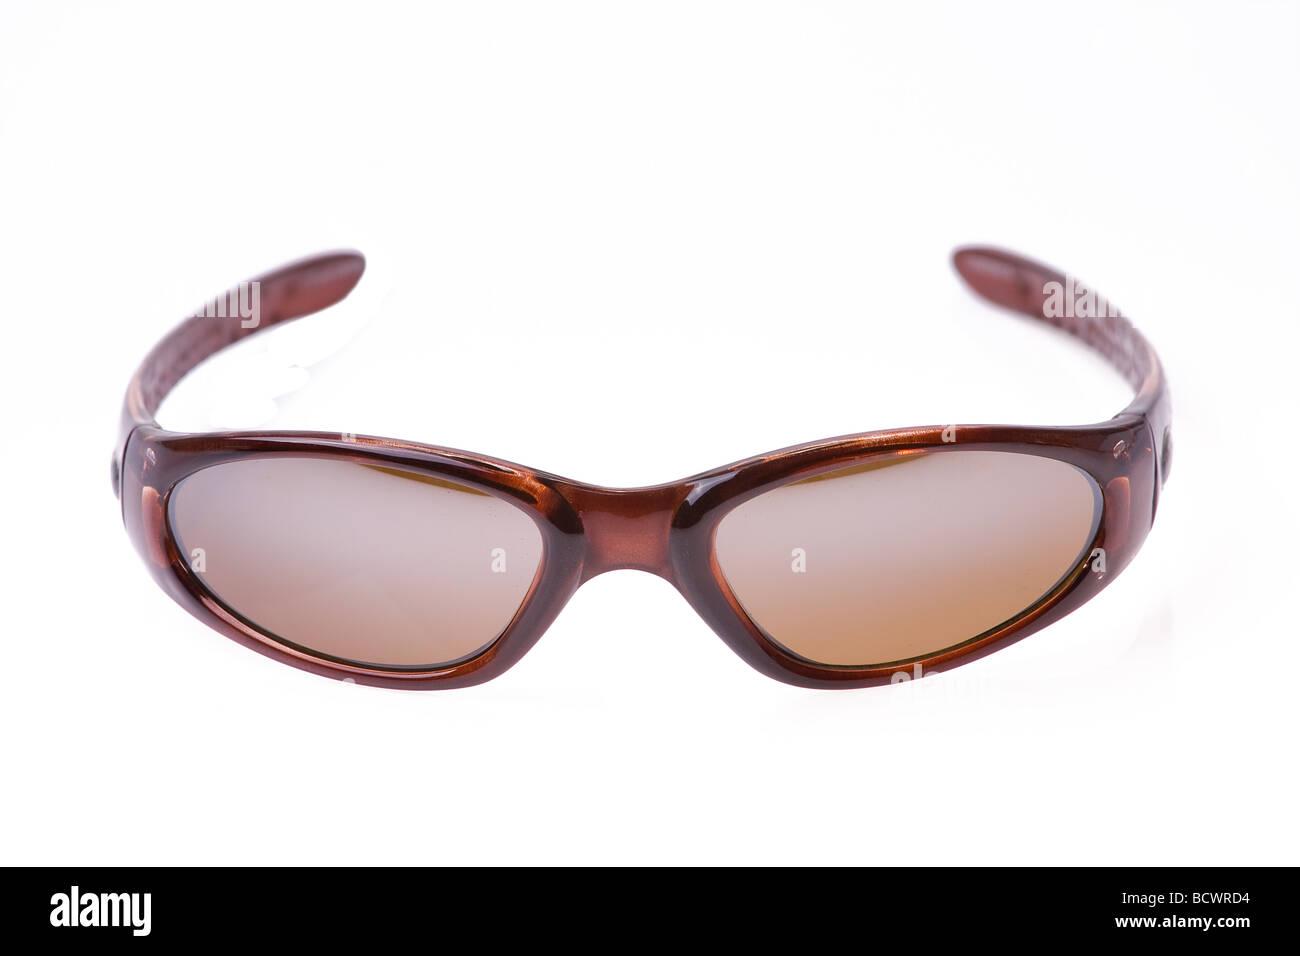 0d6b162e9c0 sports sunglasses on white background Stock Photo  25153440 - Alamy